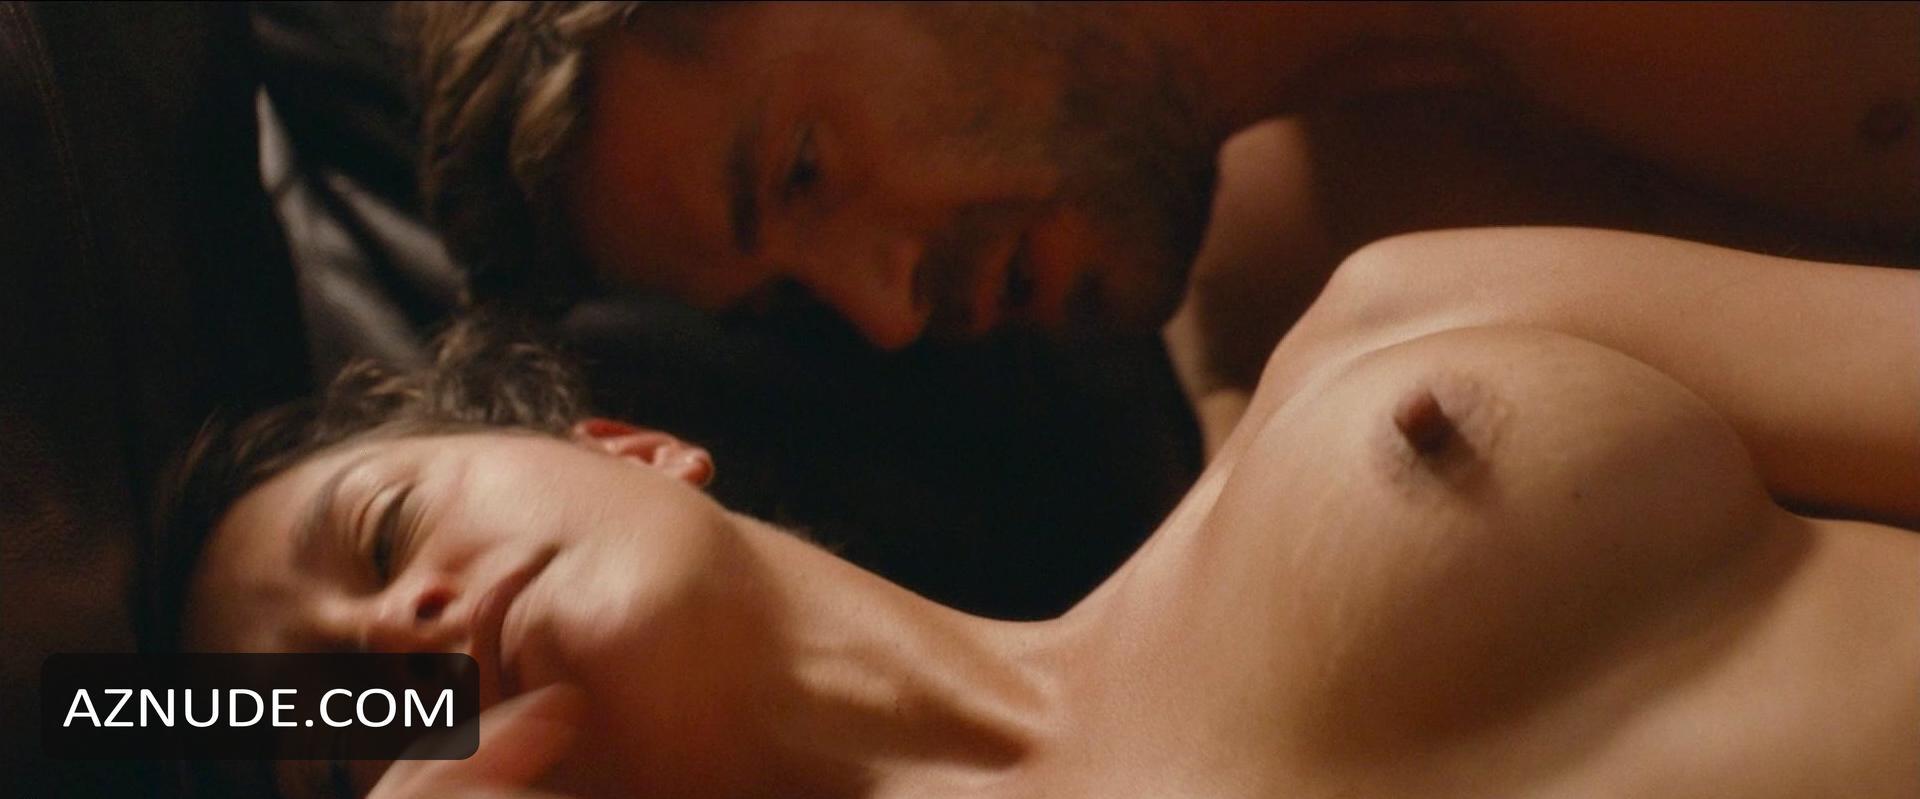 hot sex in movie